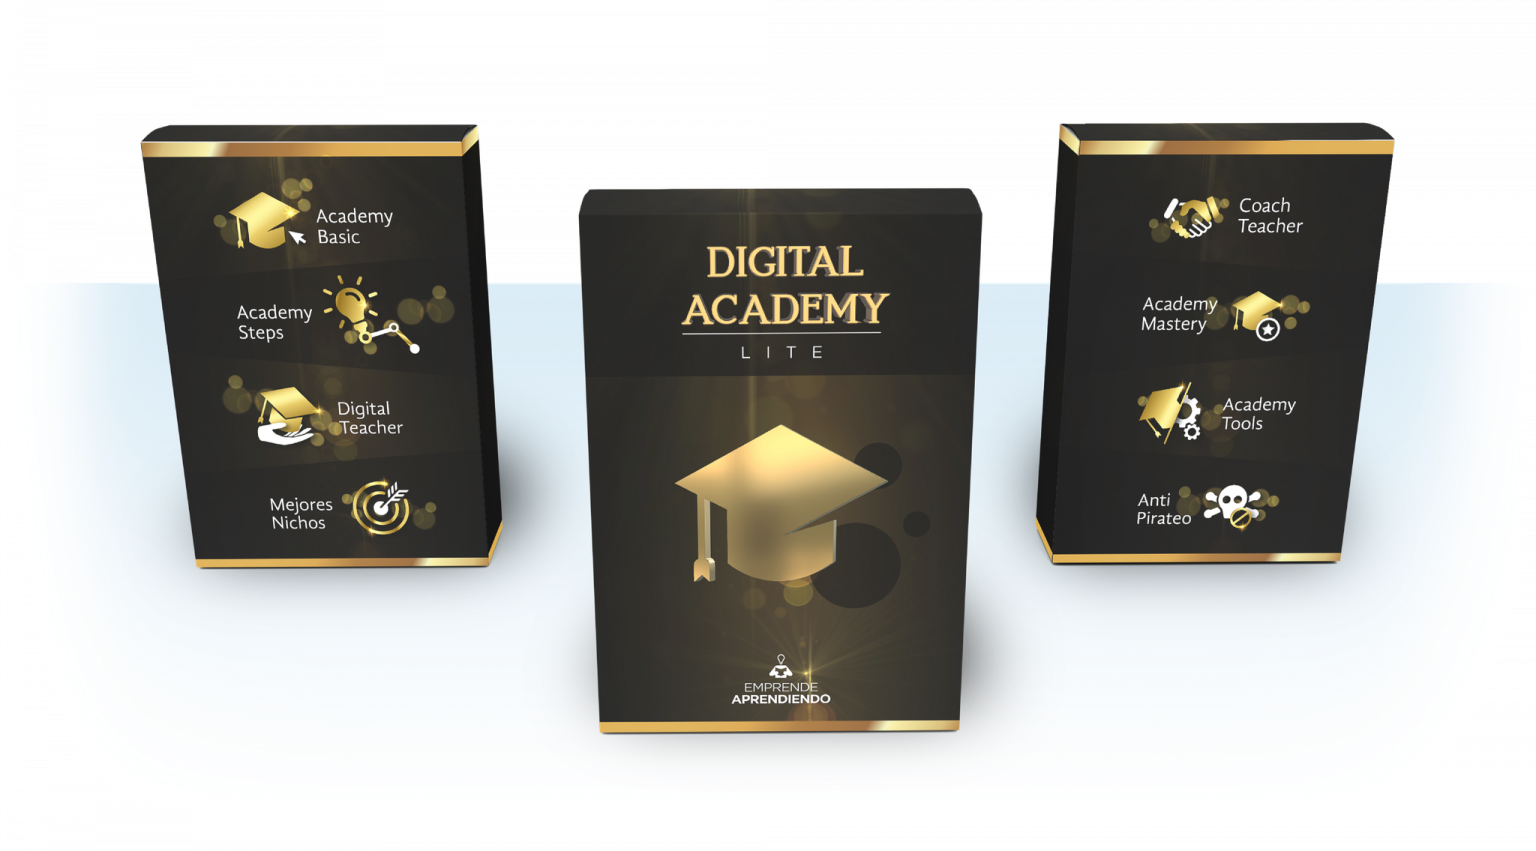 Digital Academy Lite